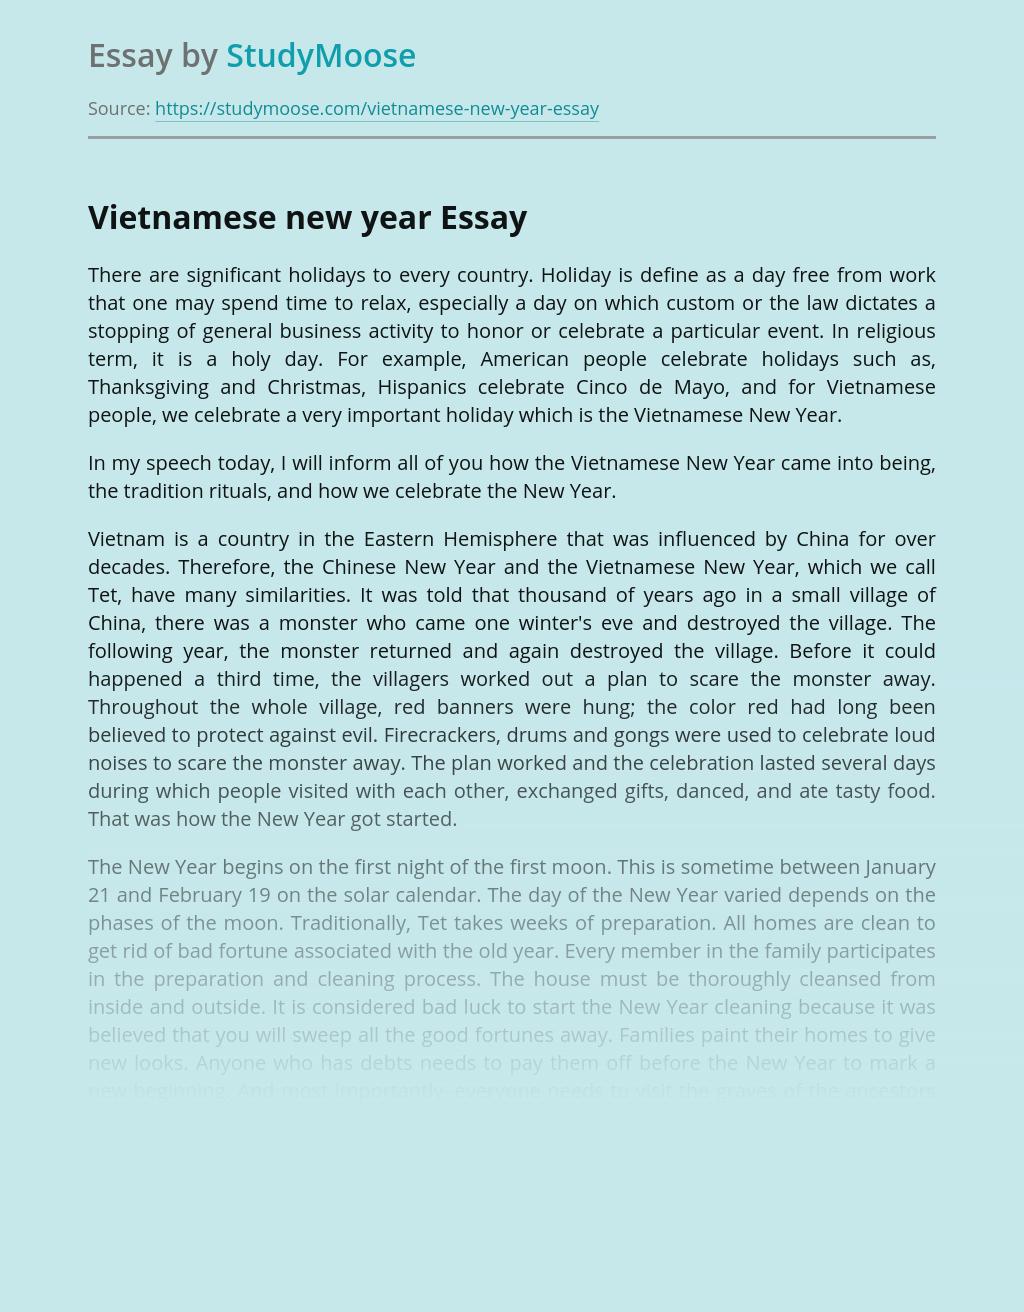 Vietnamese New Year Celebration